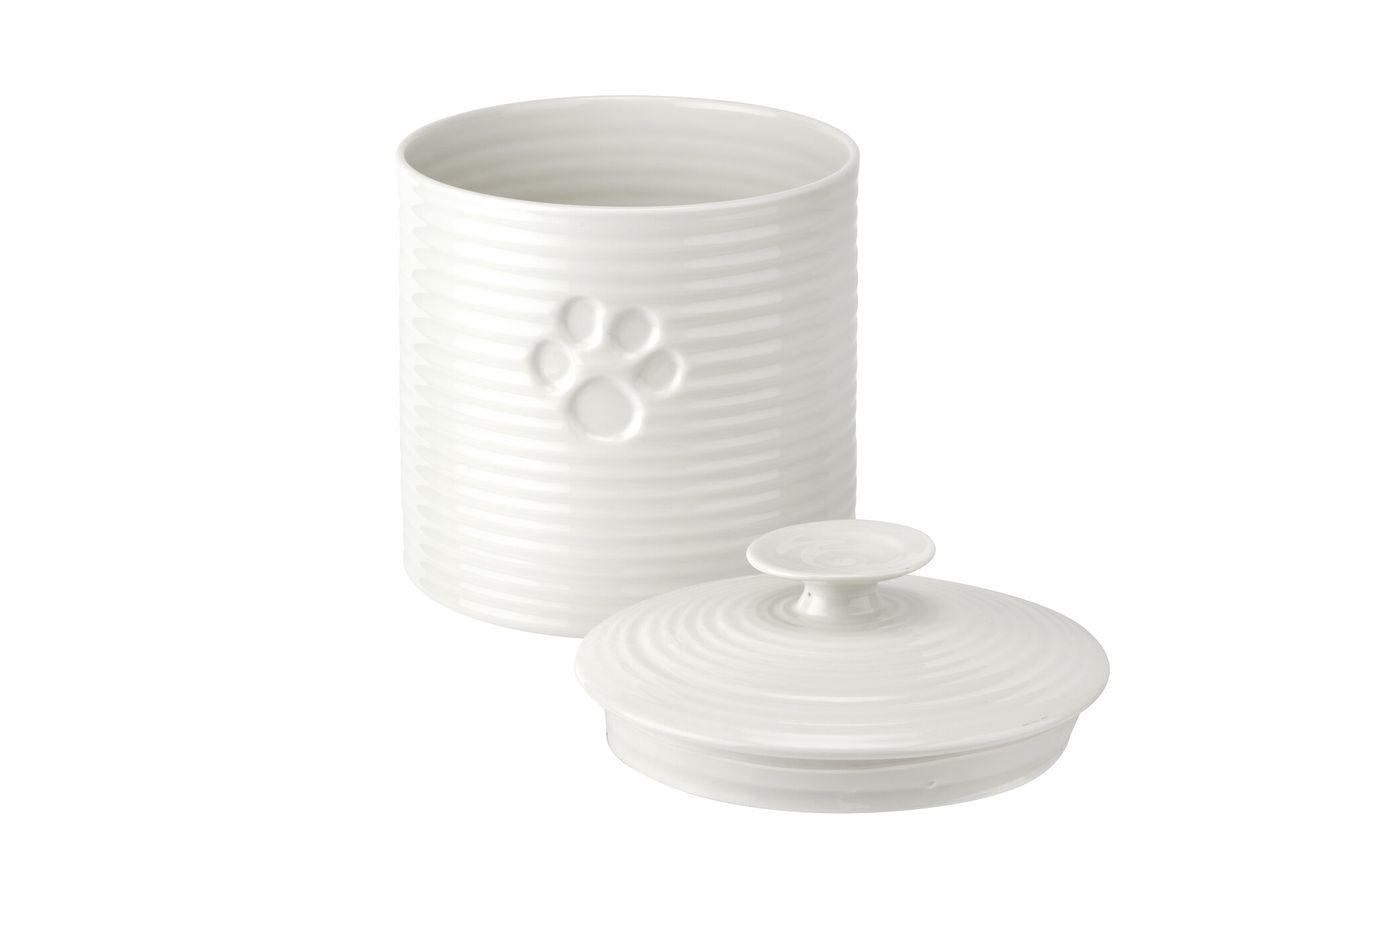 Sophie Conran for Portmeirion White Pet Treat Jar 16.5cm thumb 3